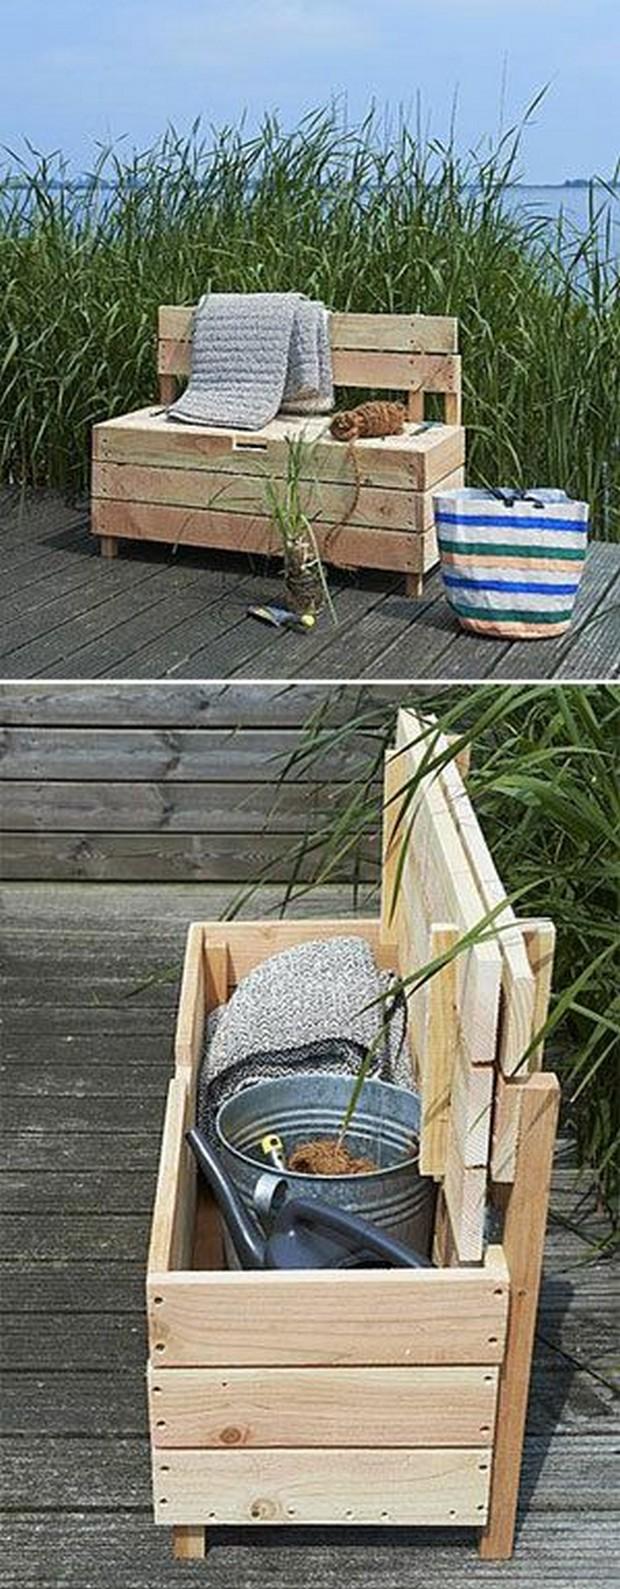 Storage Ideas with Wood Pallets | Pallet Ideas